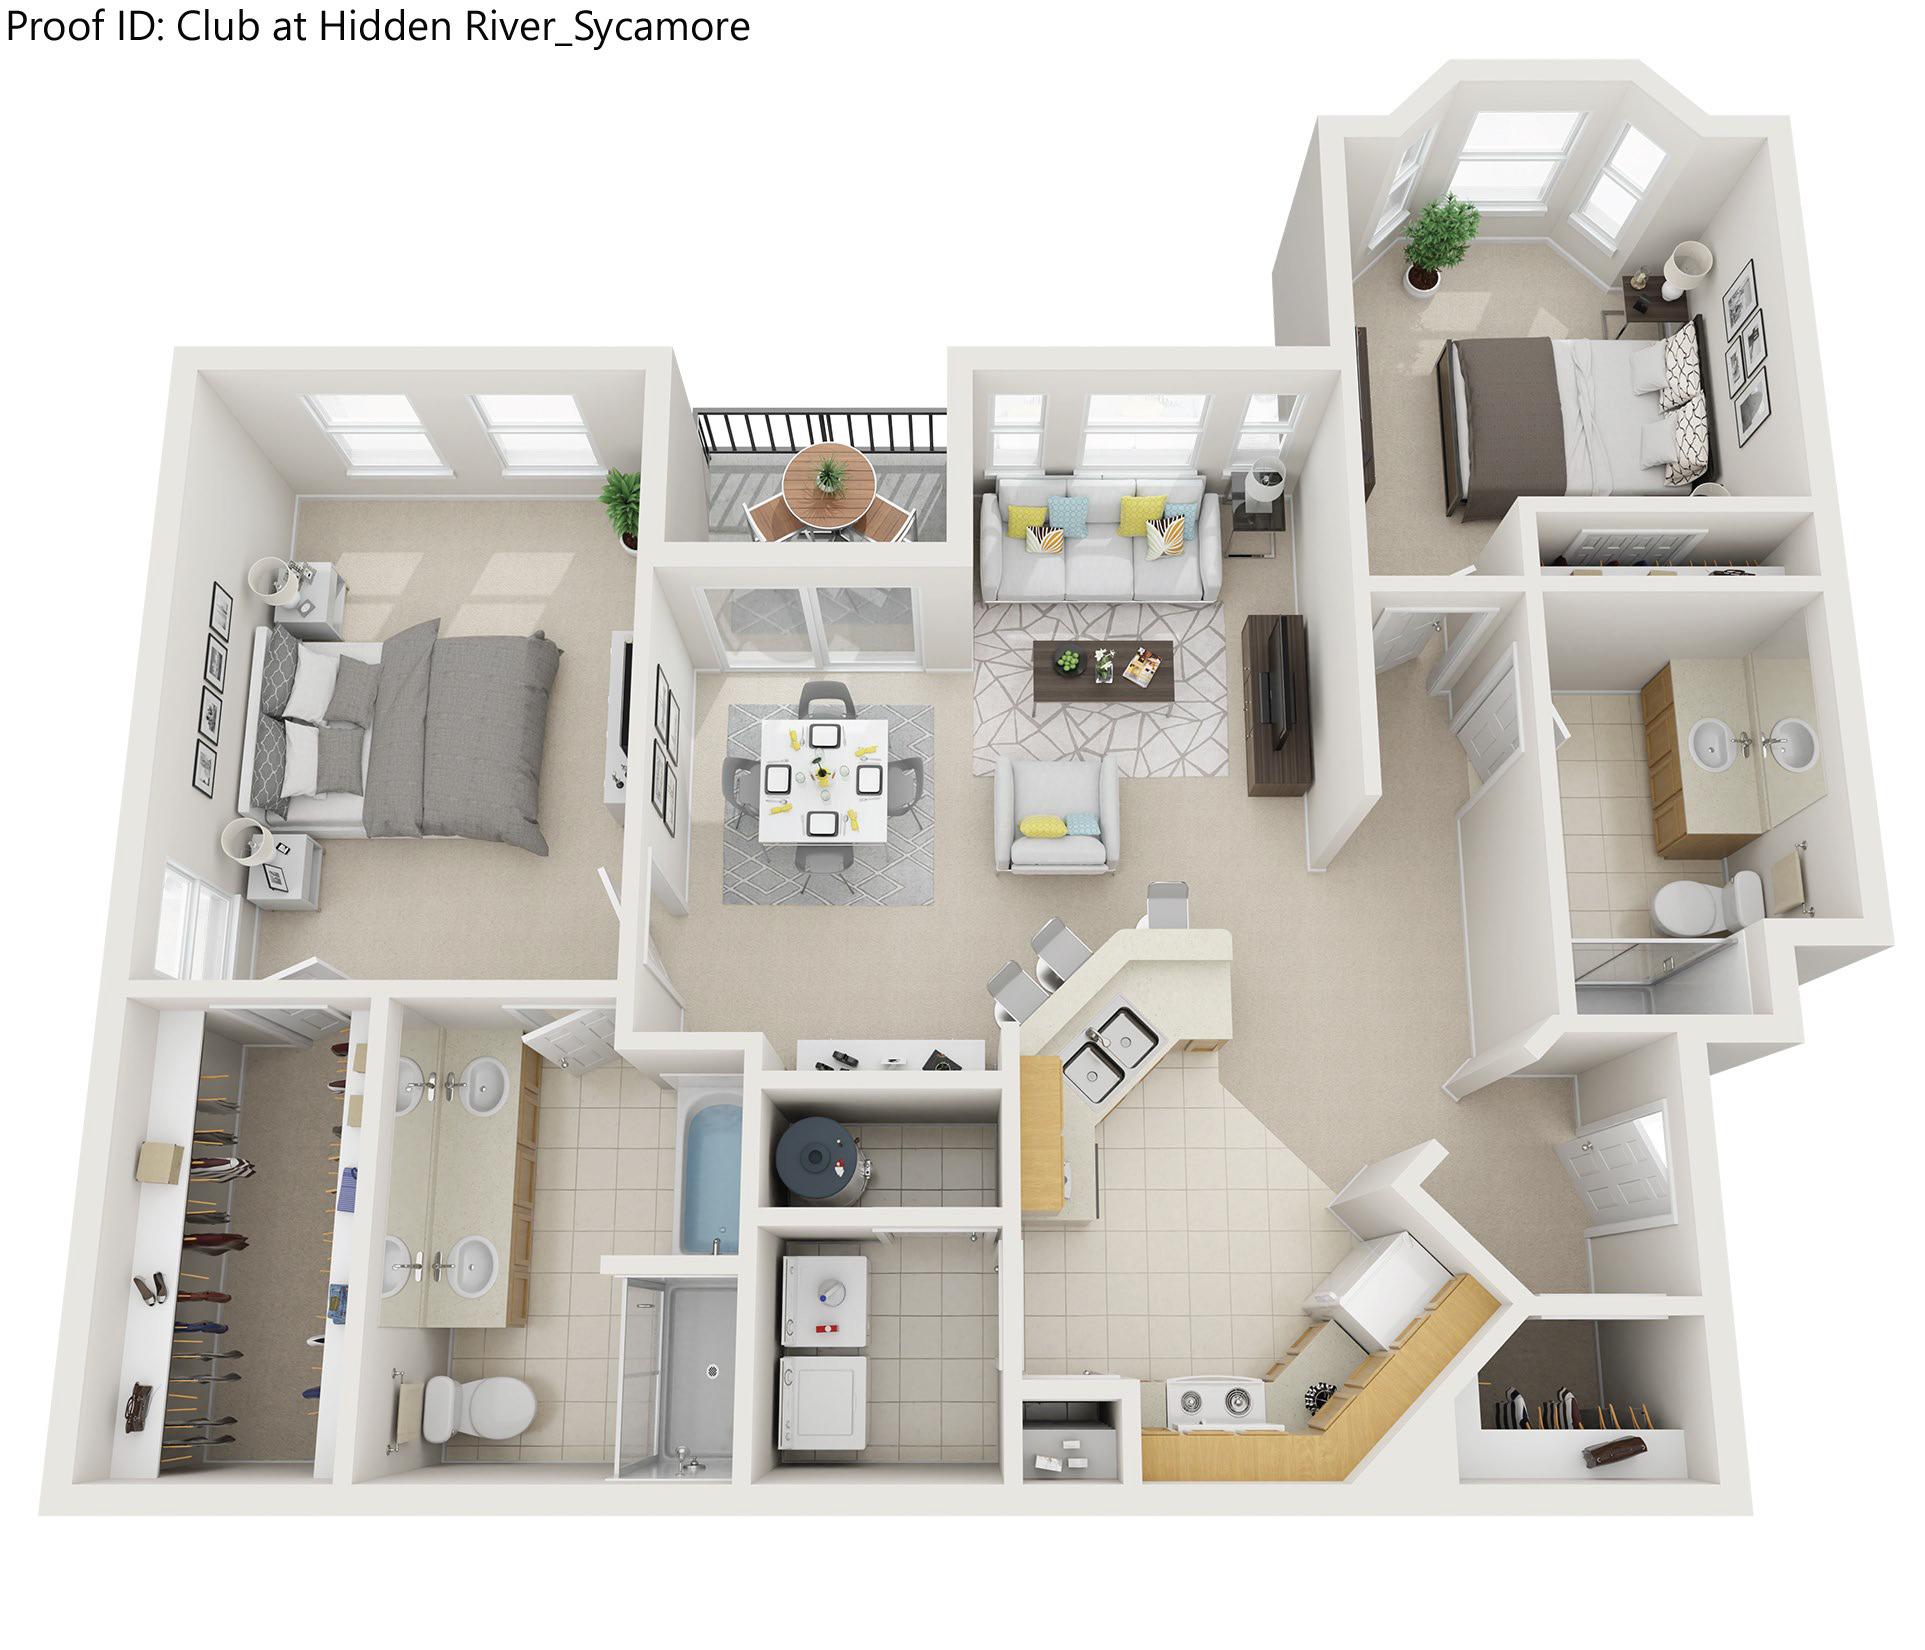 Floor plan image of Sycamore